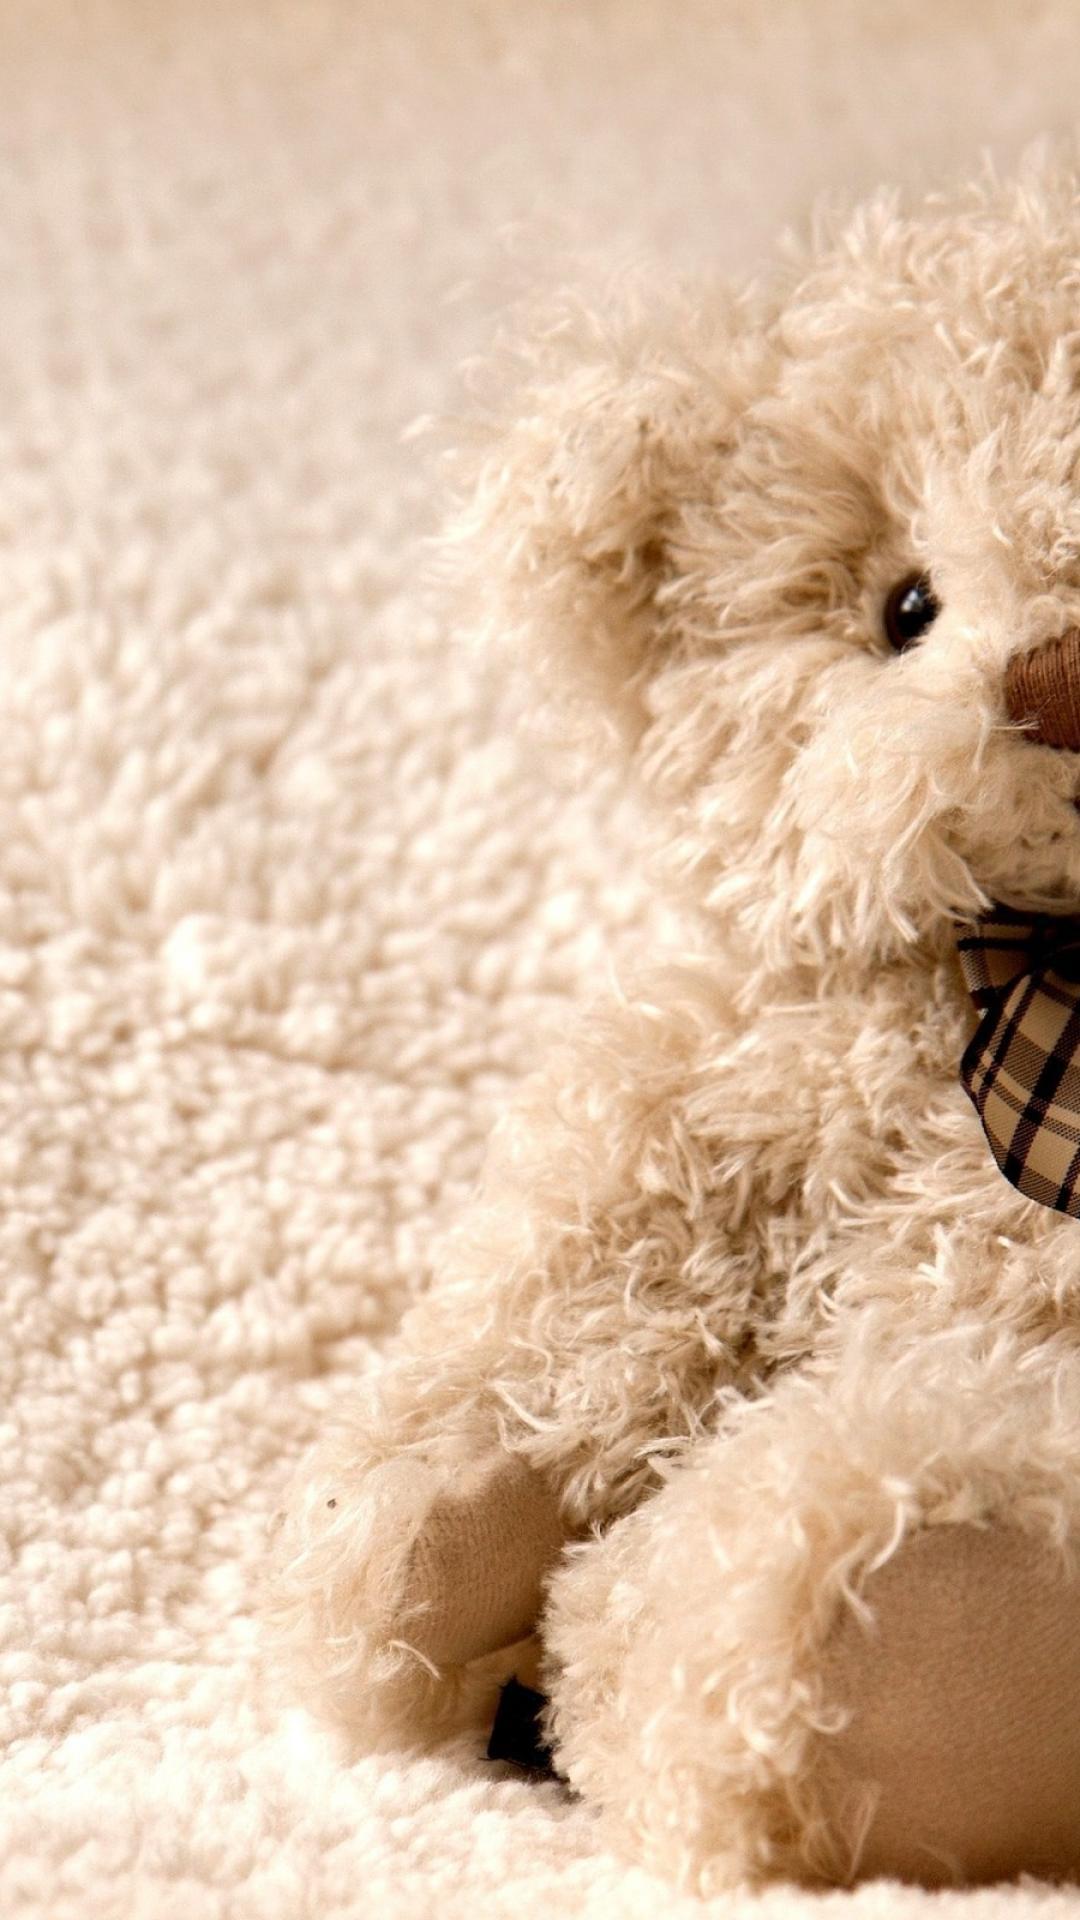 Cute teddy bear wallpaper 86260 1080x1920